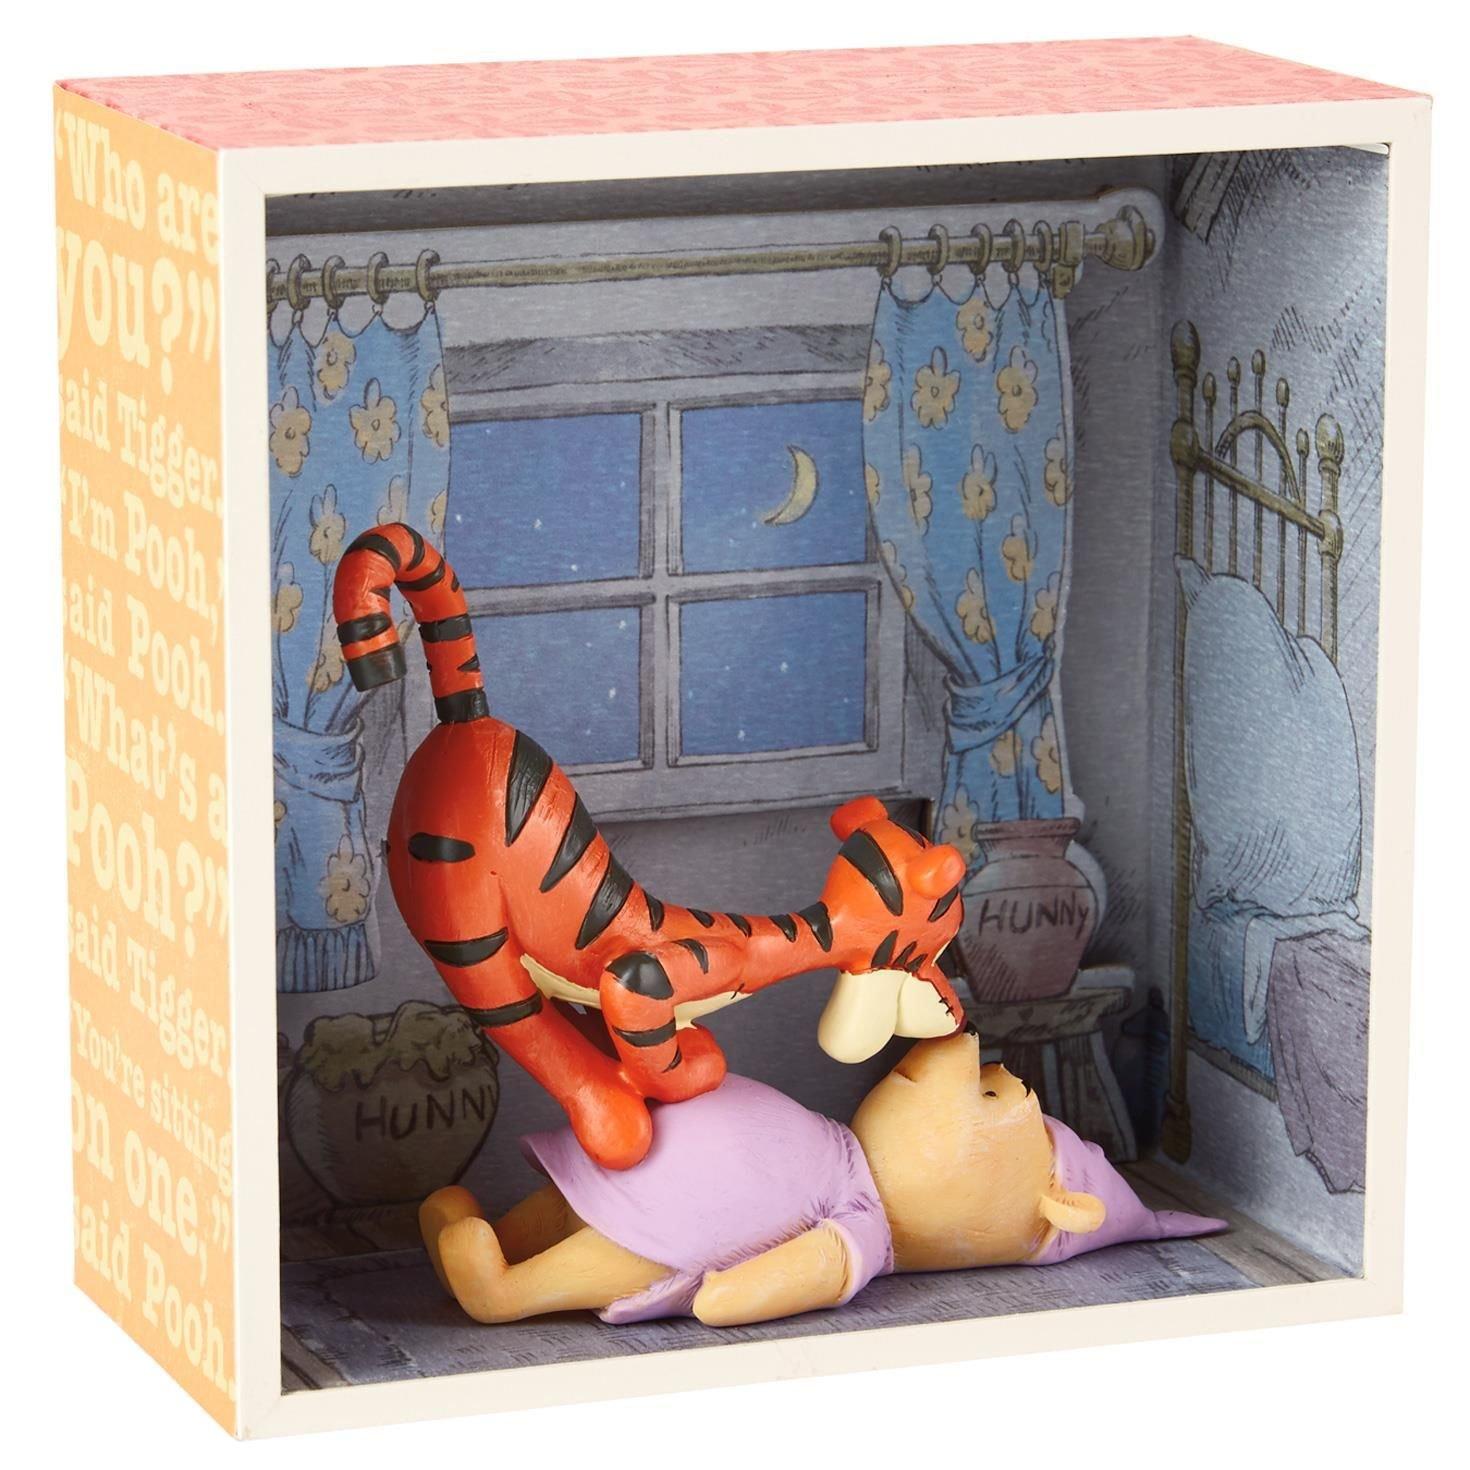 Hallmark Winnie the Pooh Meets Tigger Shadow Box